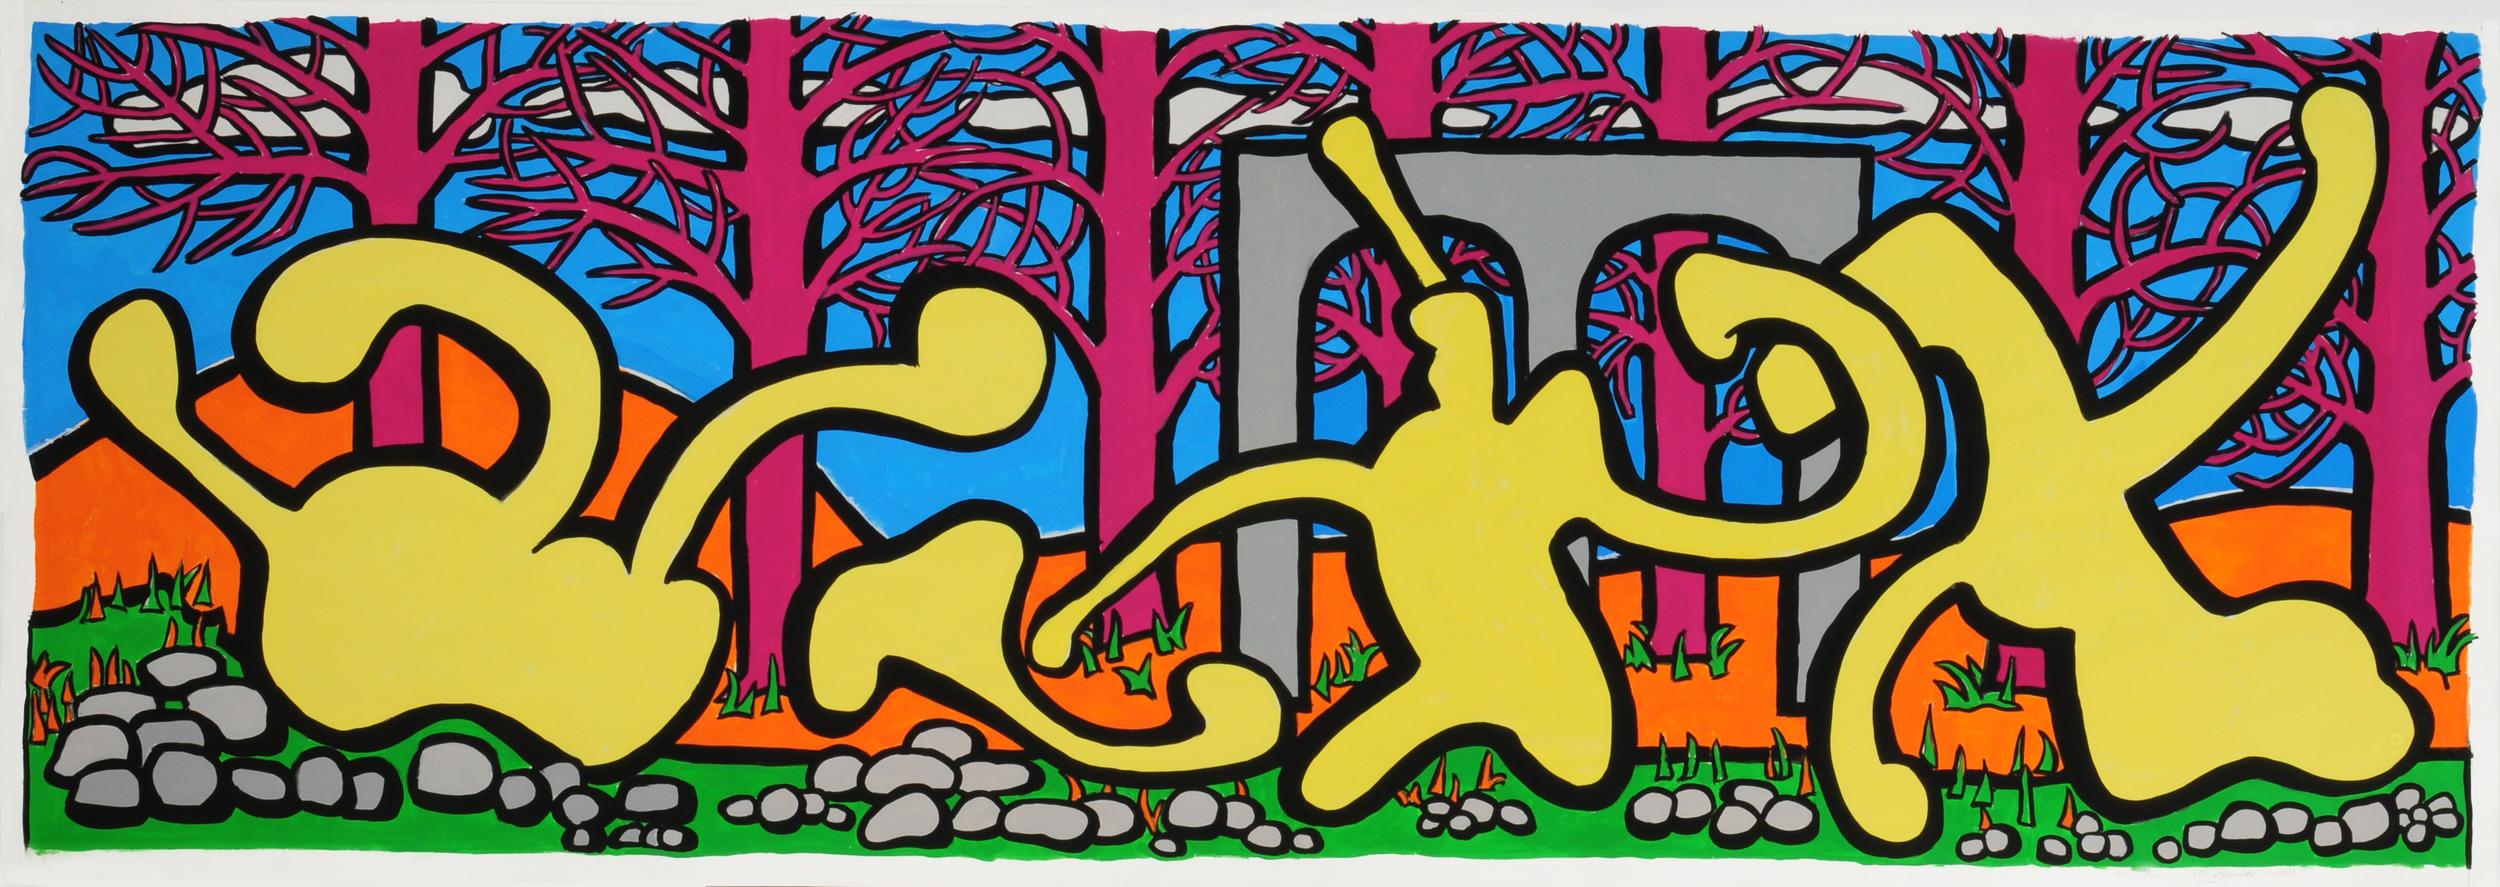 "Visitors III , 36"" x 102"", gouache,2011"